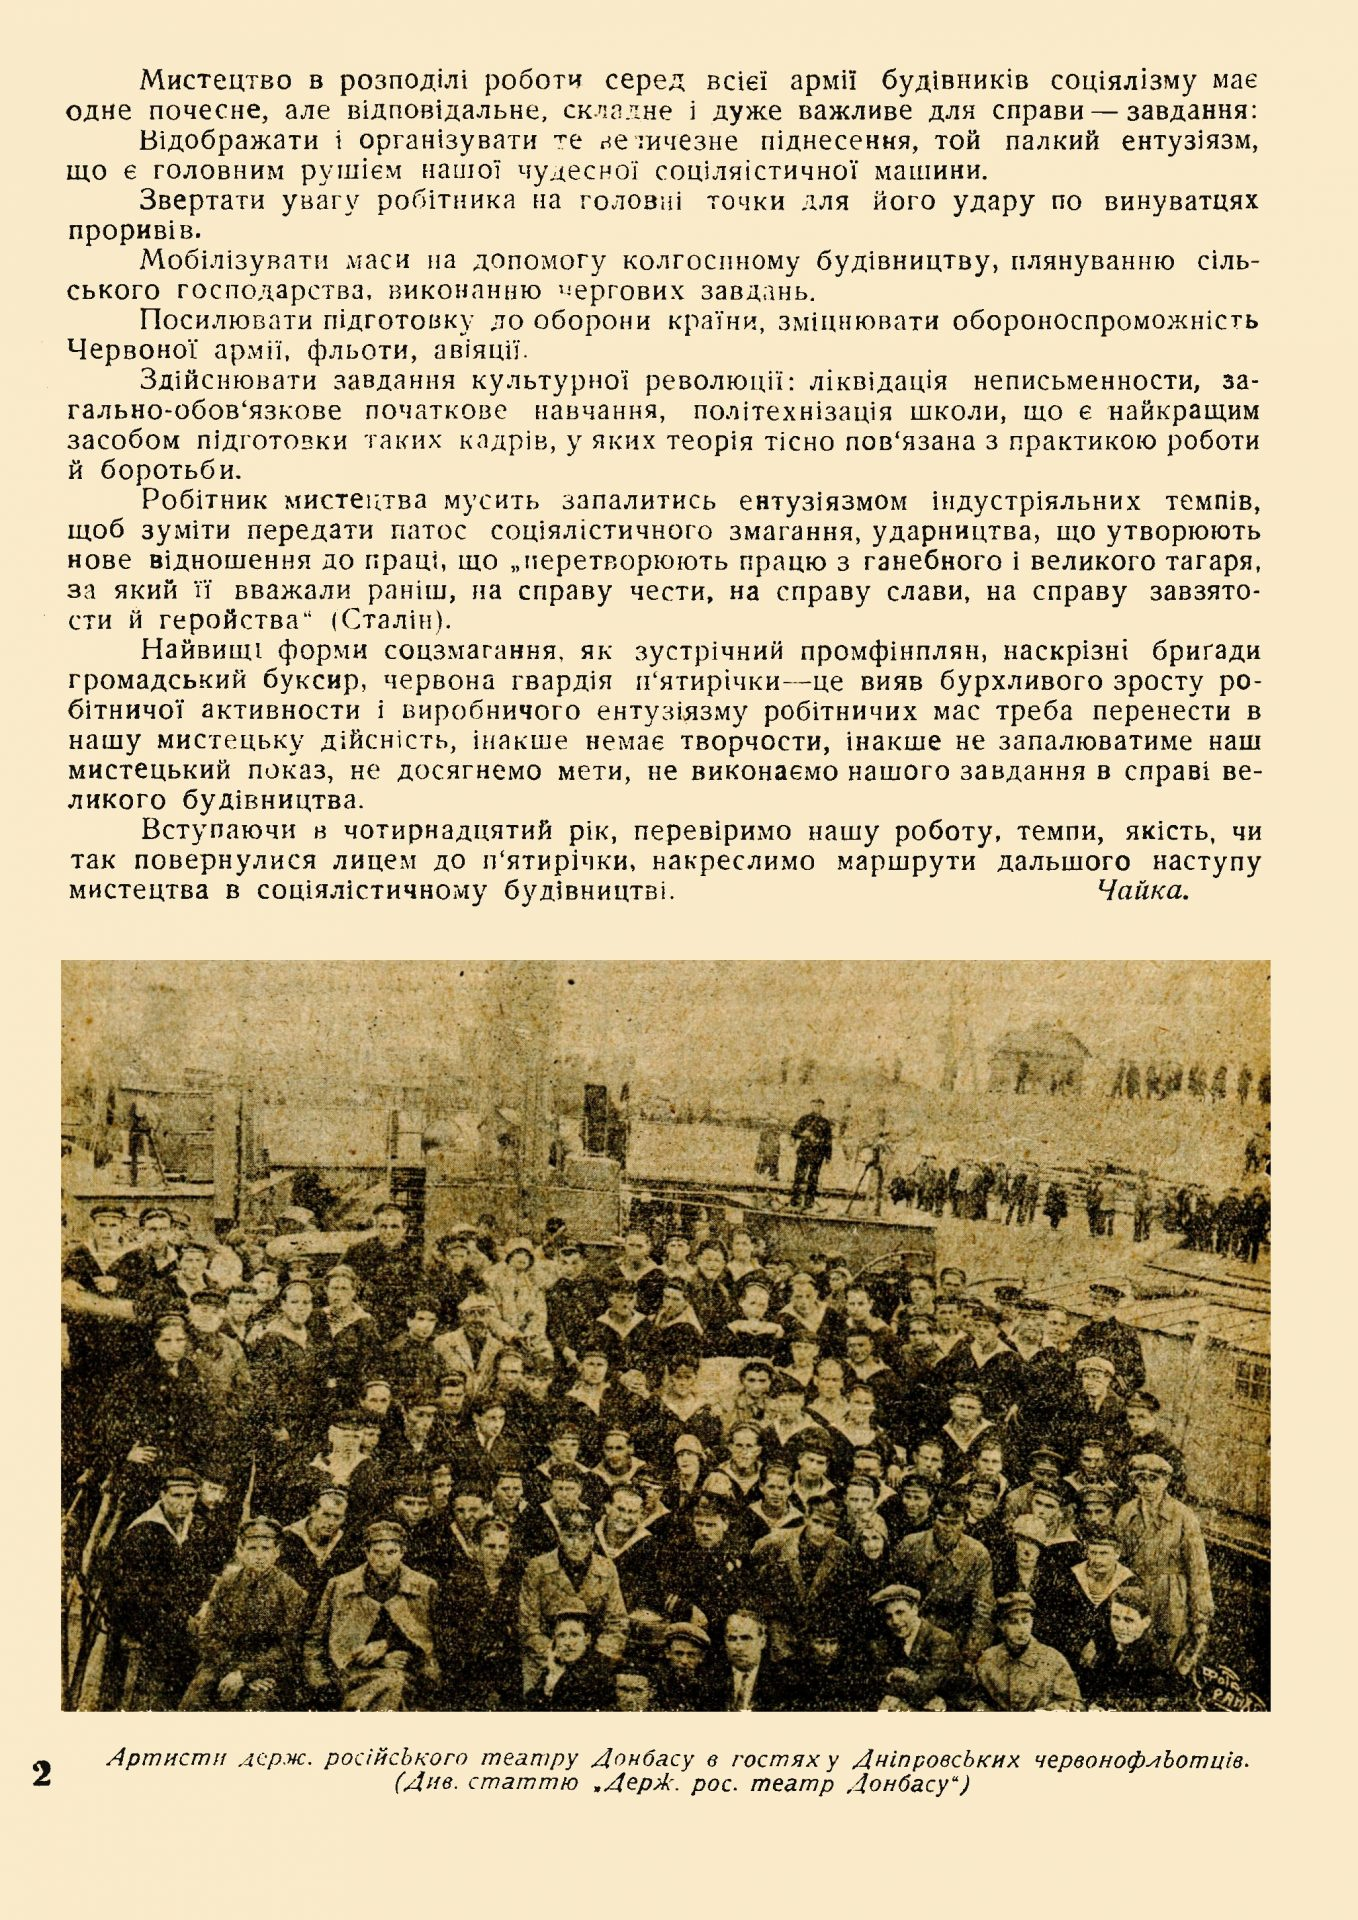 Мистецька трибуна_1930_№ 17